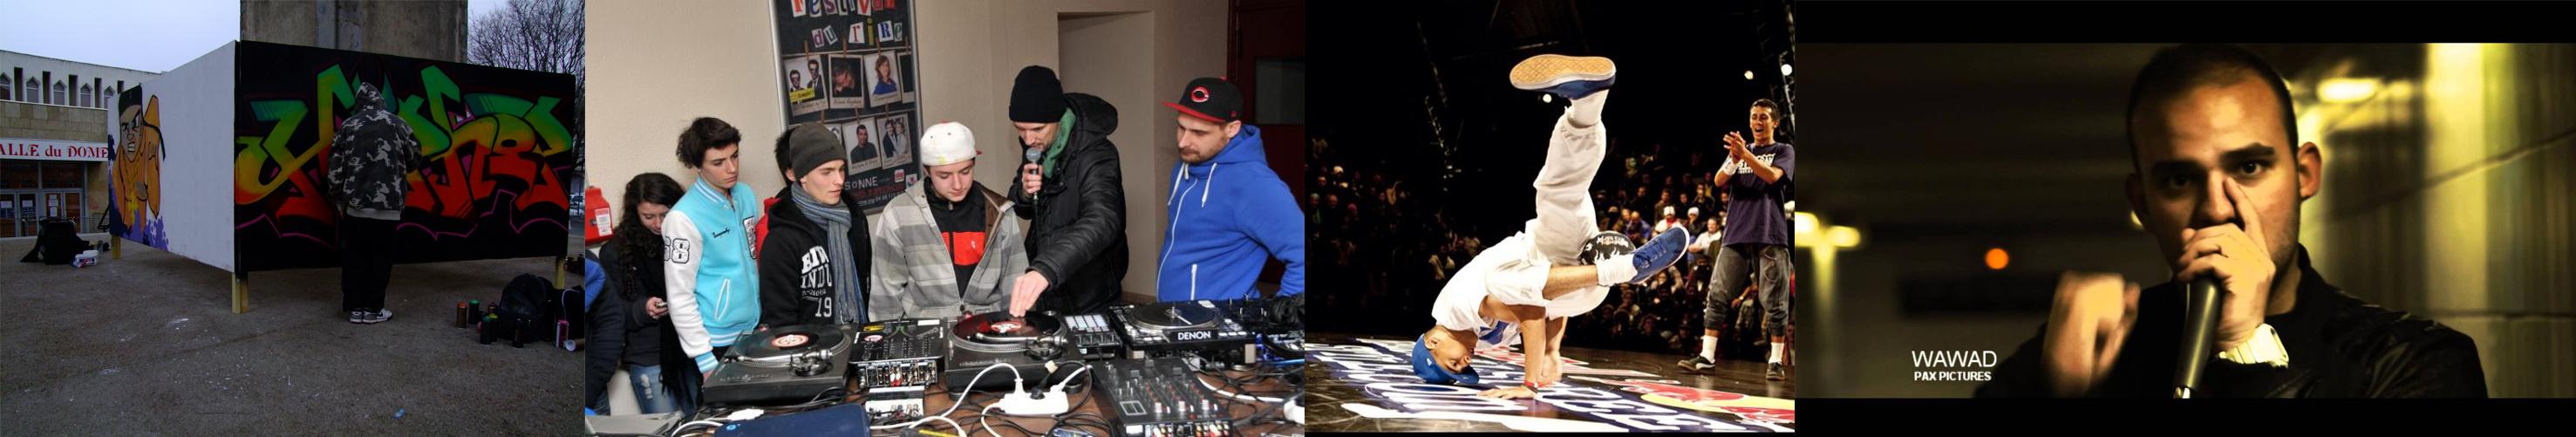 villageurbain  festival l'epopée hip hop